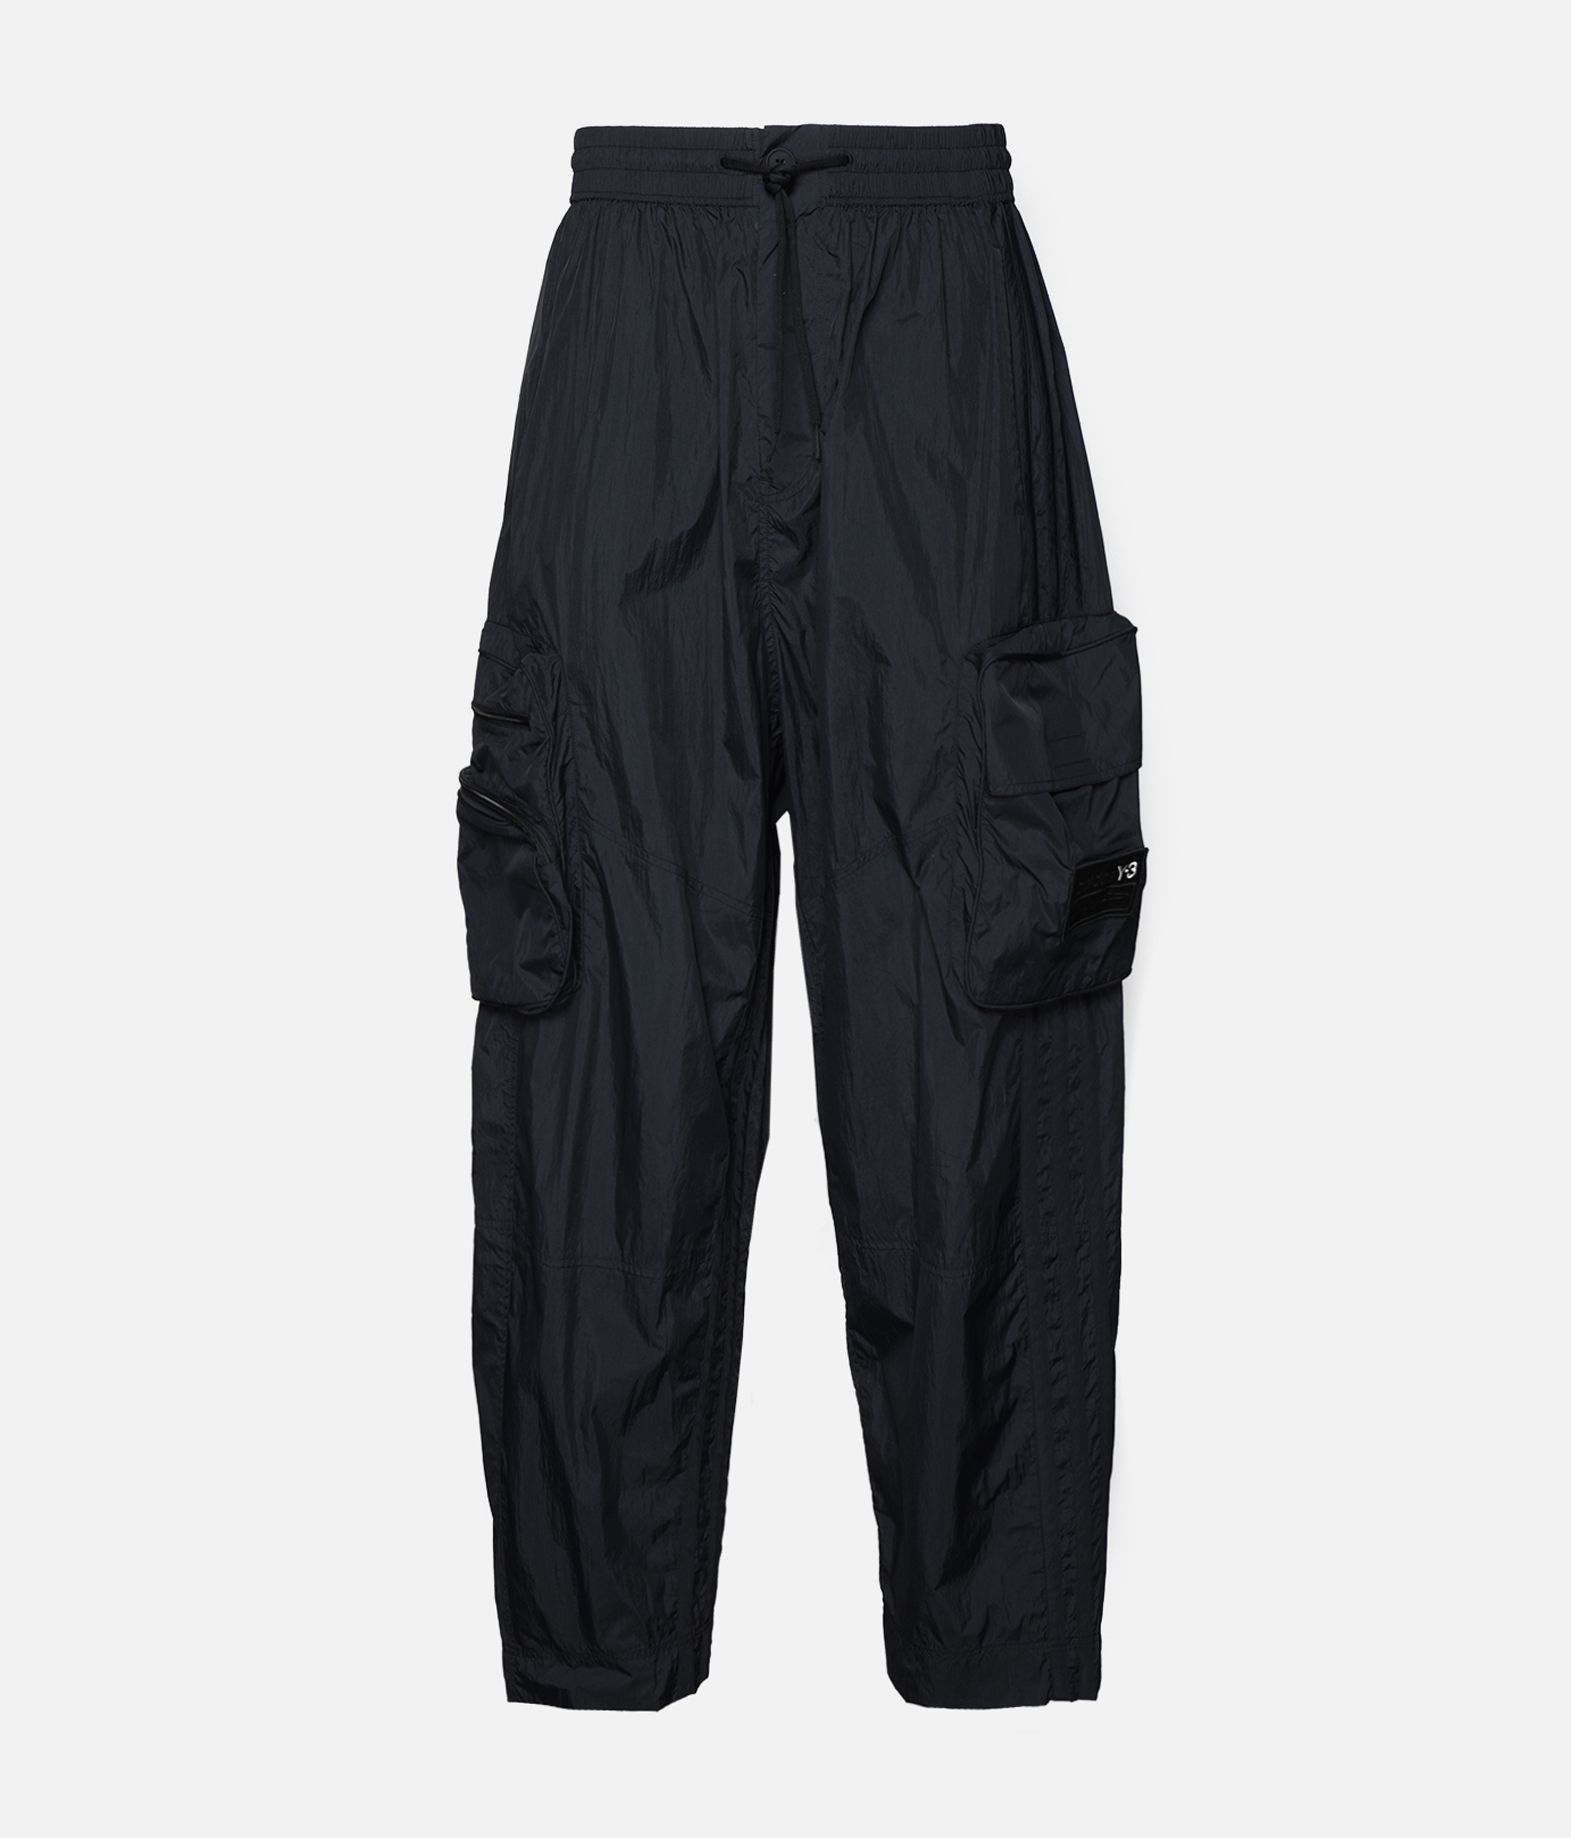 Y-3 Y-3 Shell Track Pants Track pant Herr f